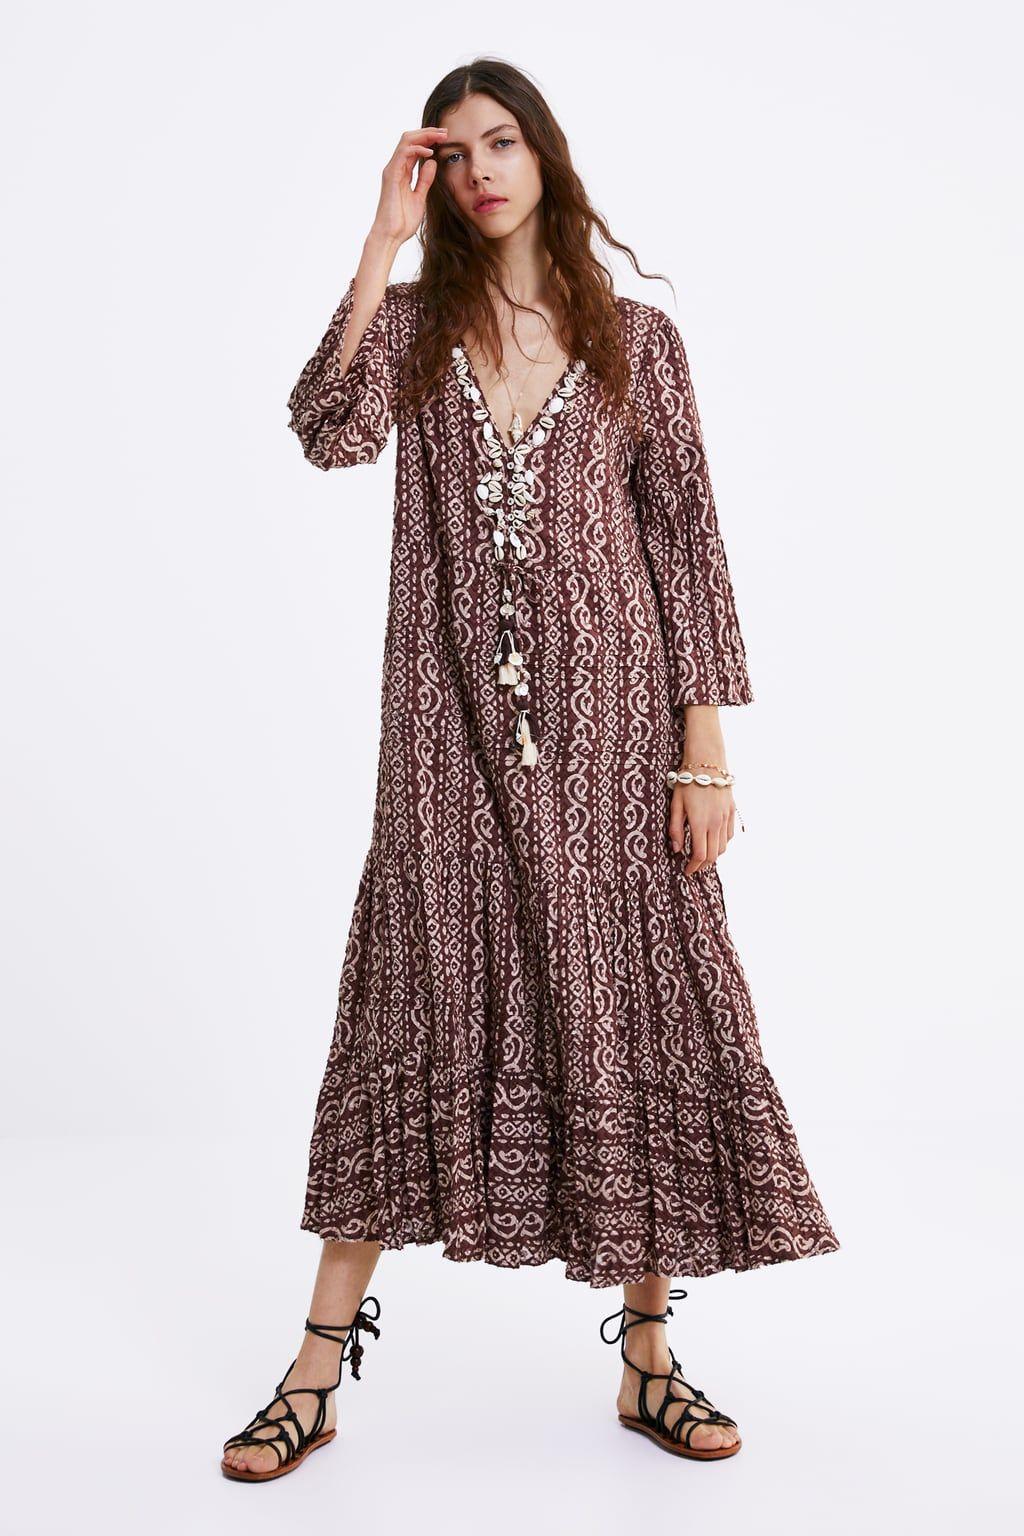 zara - mujer - vestido estampado conchas | bedruckte kleider